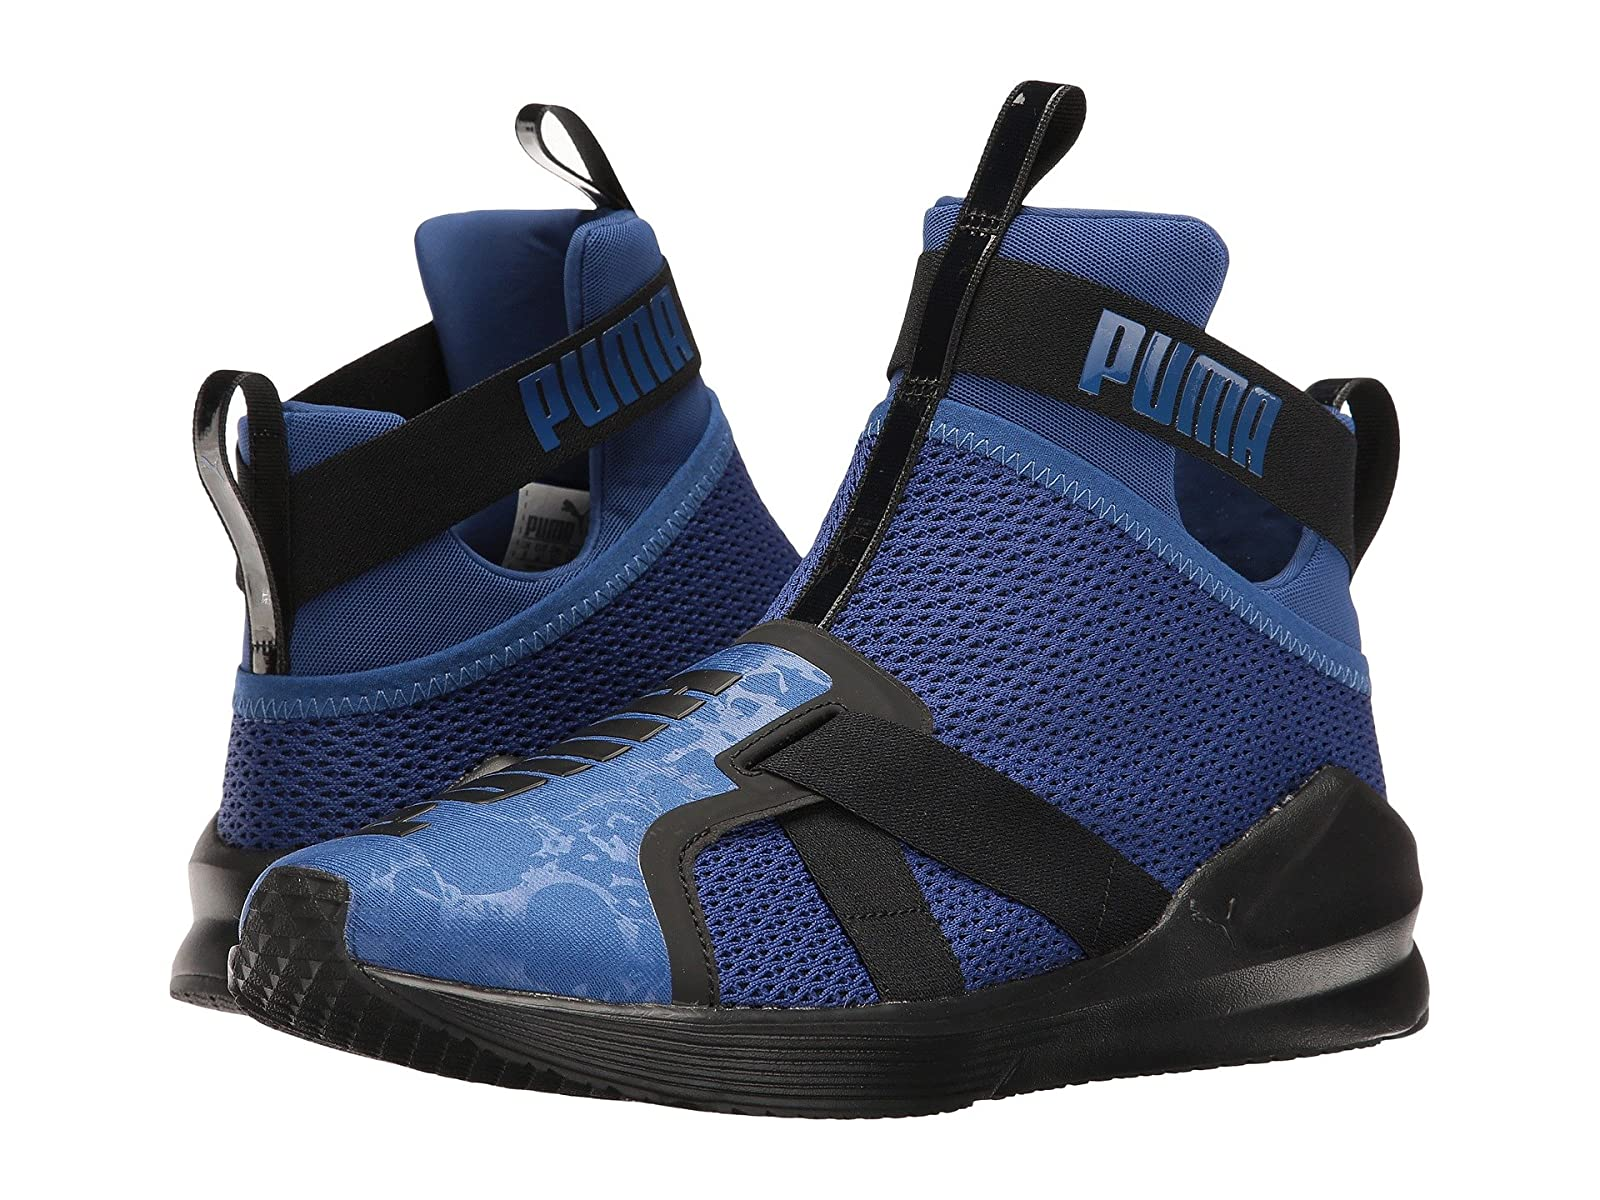 PUMA Fierce StrapCheap and distinctive eye-catching shoes